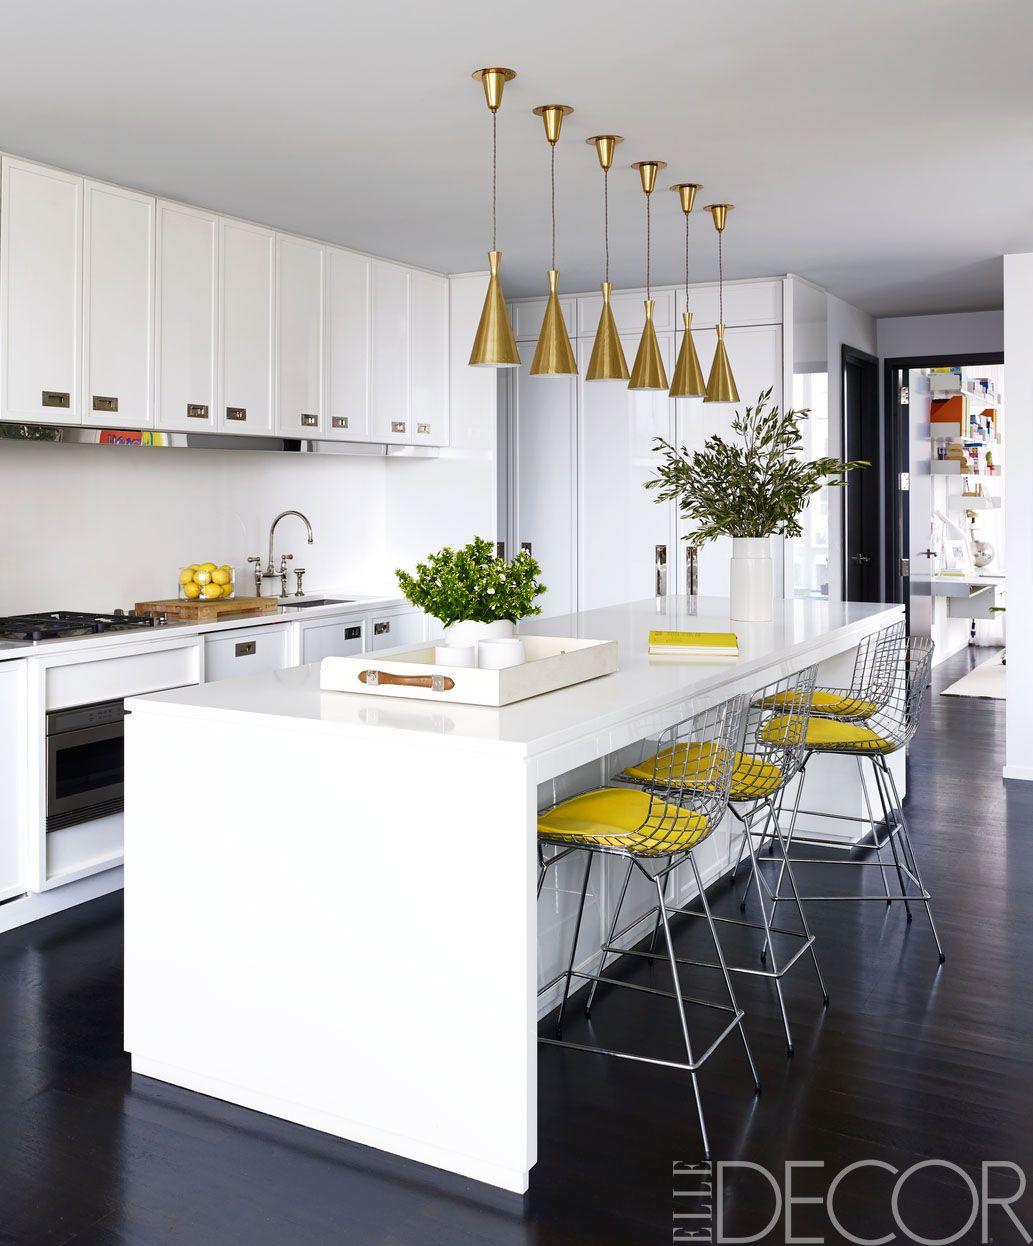 50 stylish kitchen islands photos of amazing kitchen island ideas rh elledecor com kitchen island design plans kitchen island designs ikea